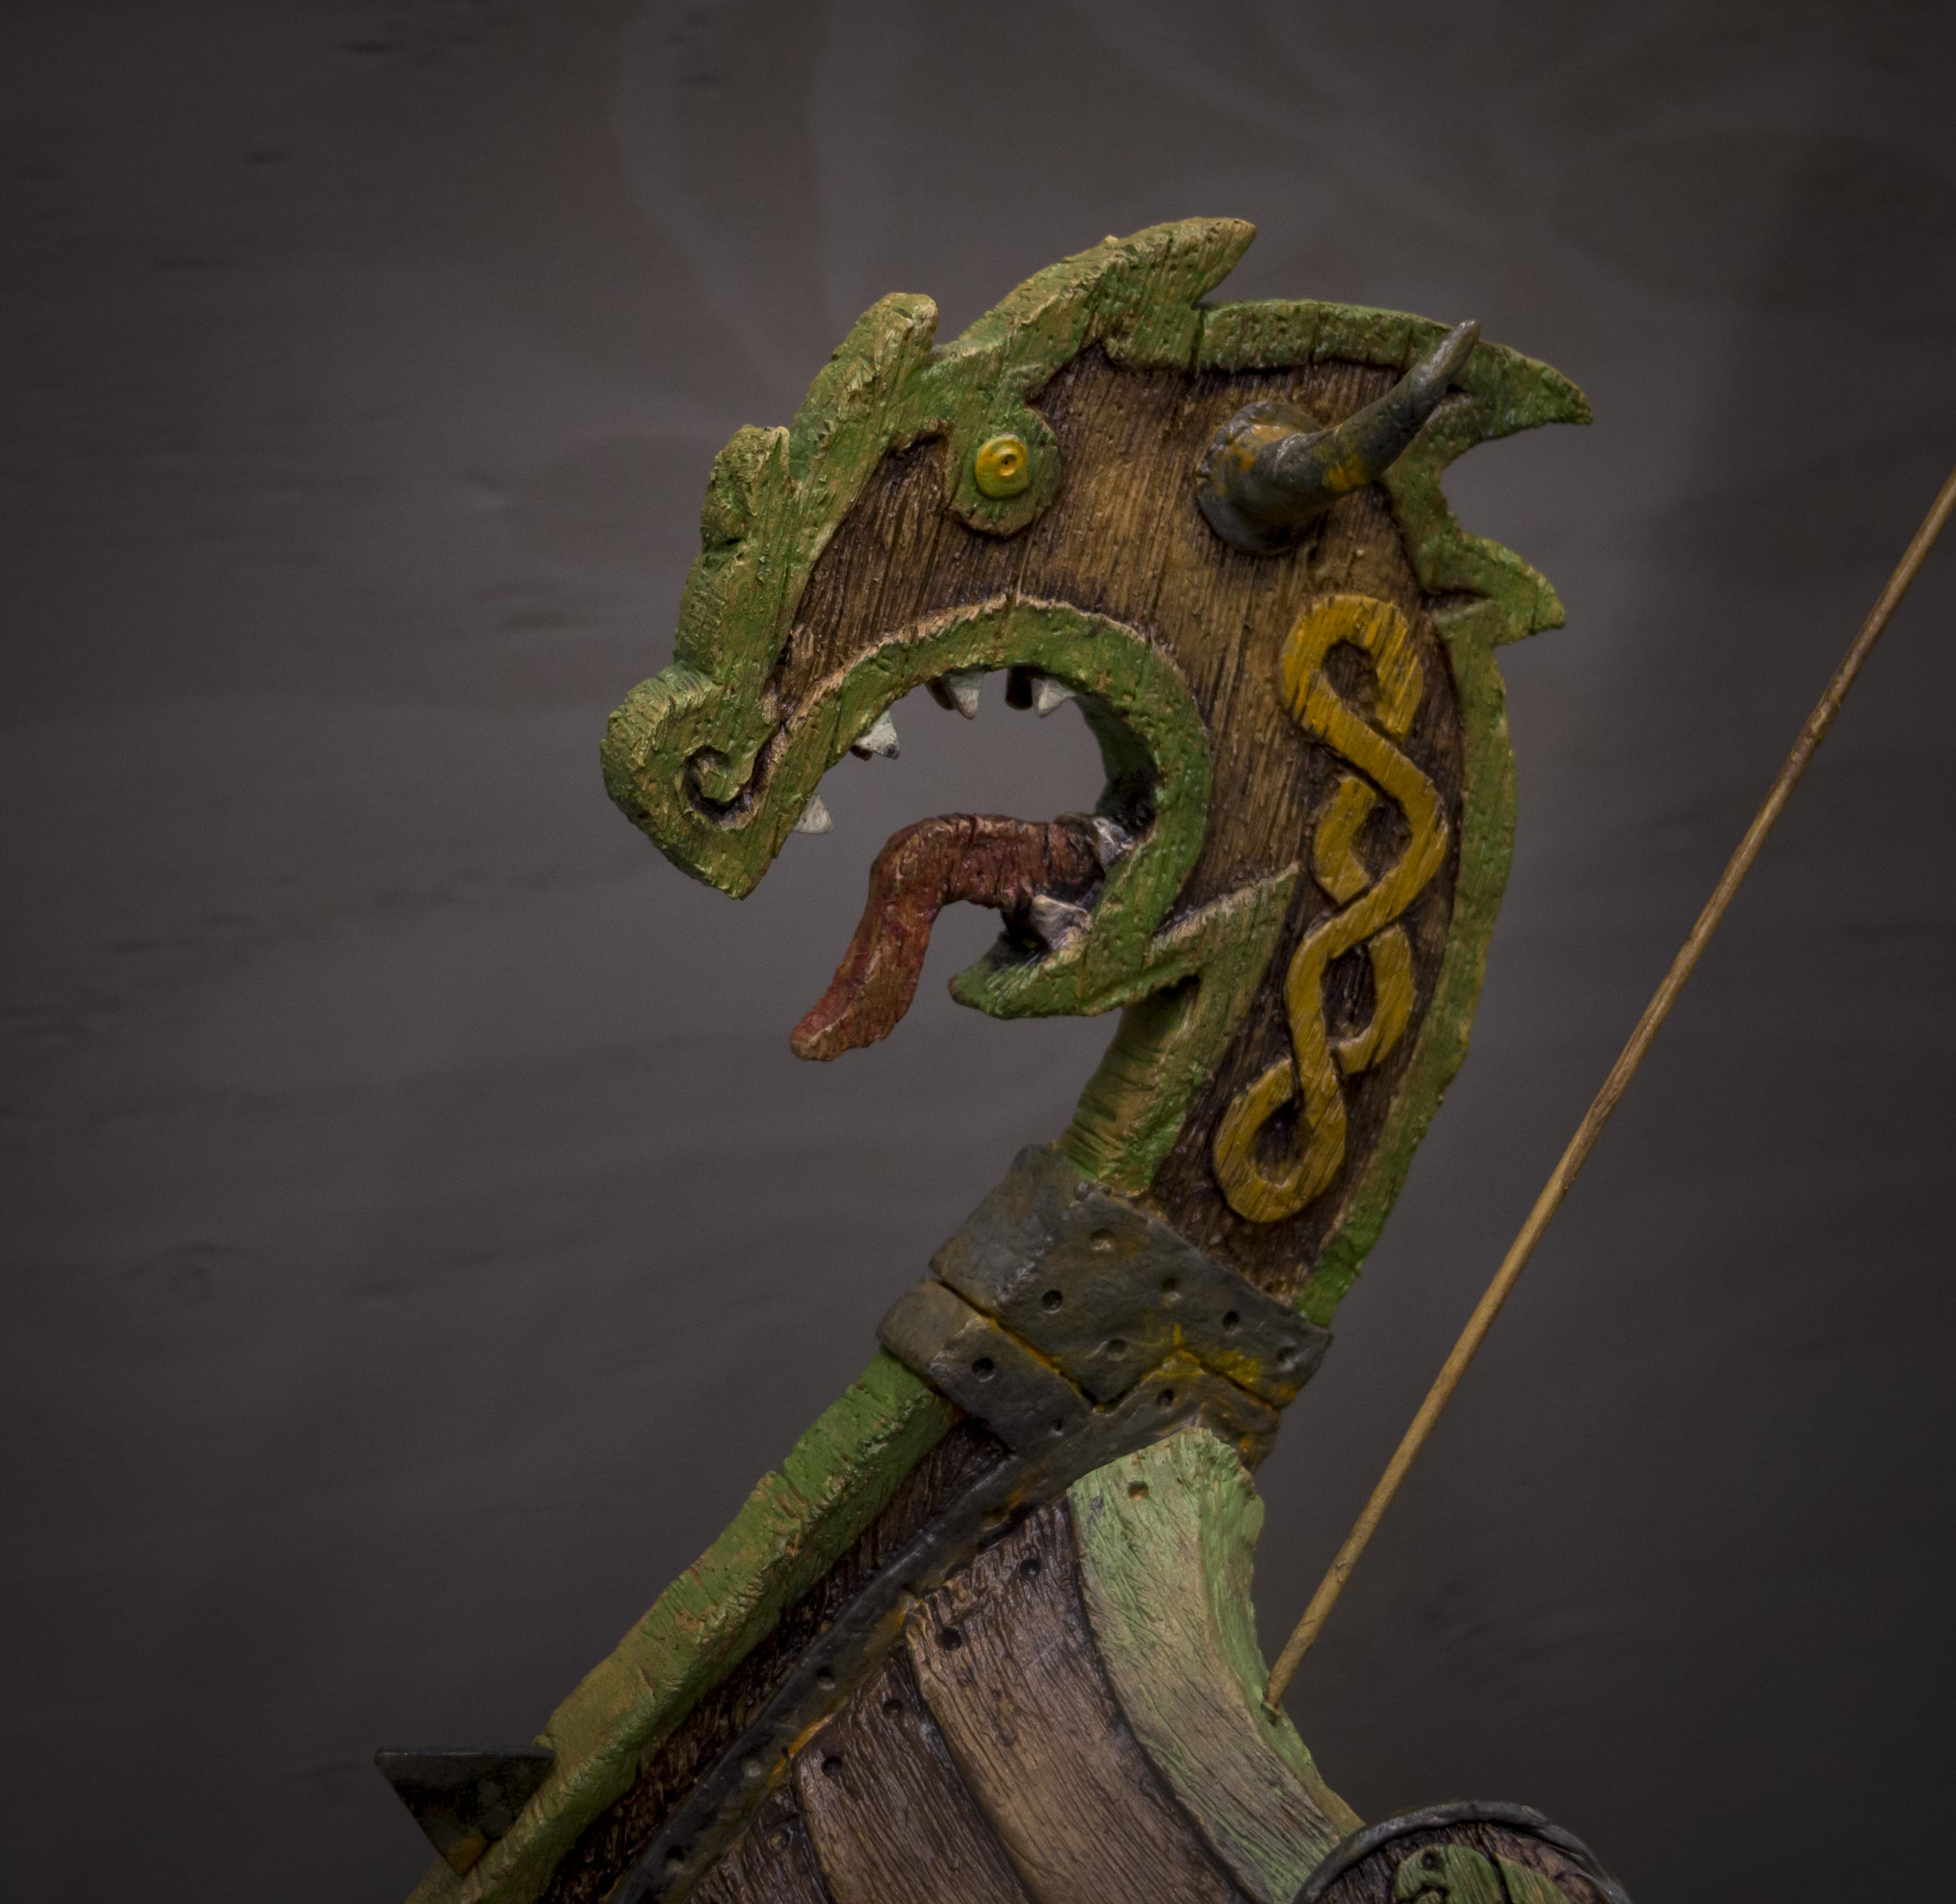 viking-ship-model-3.jpg